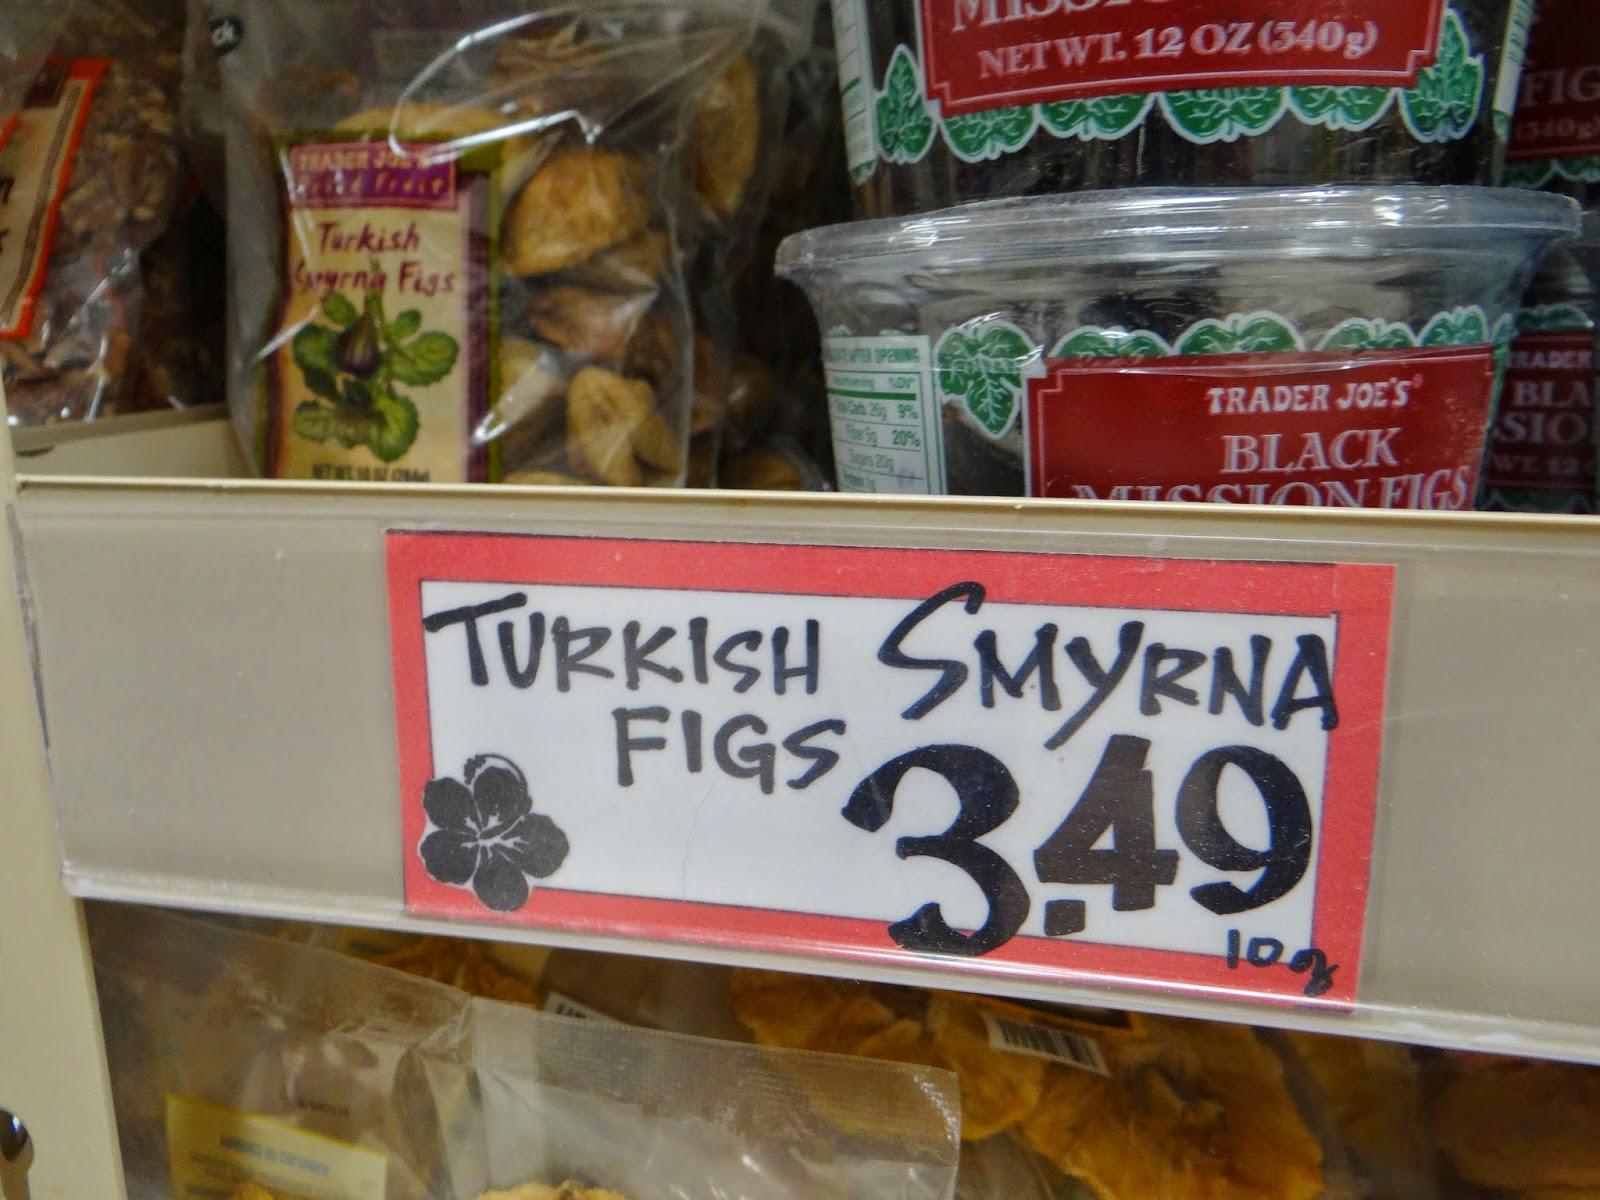 Smyrna Dried Turkish Figs | Dried Fig